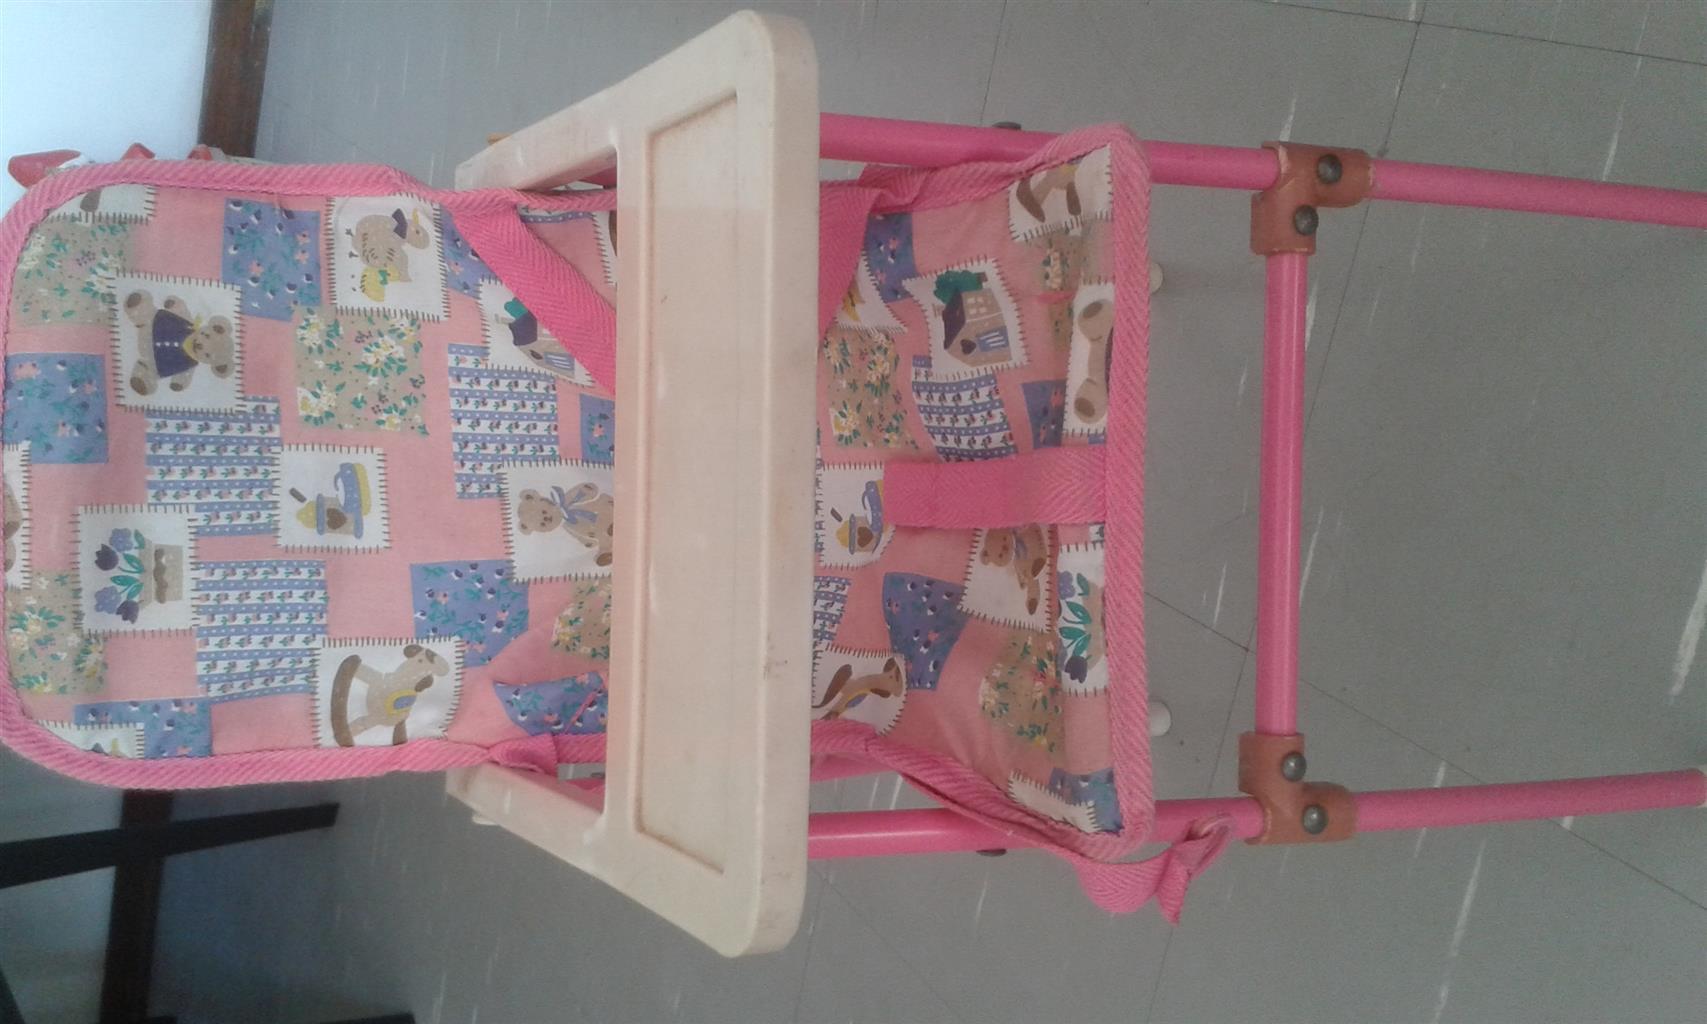 Doll high chair and bath set and Lego blocks